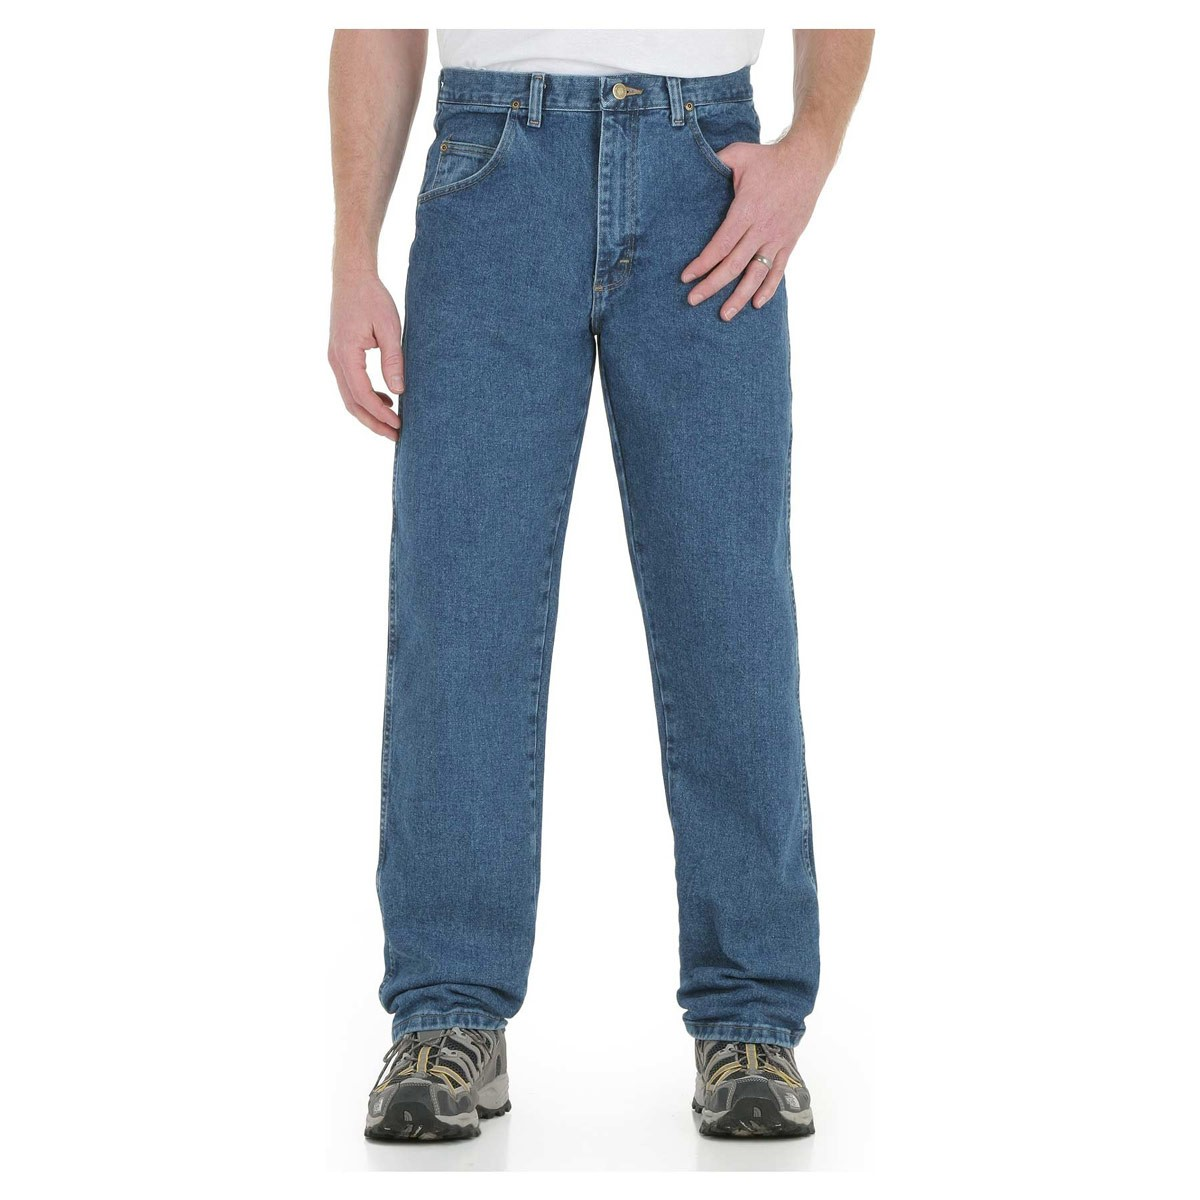 wrangler jeans the western jeans construction gear guru blog. Black Bedroom Furniture Sets. Home Design Ideas